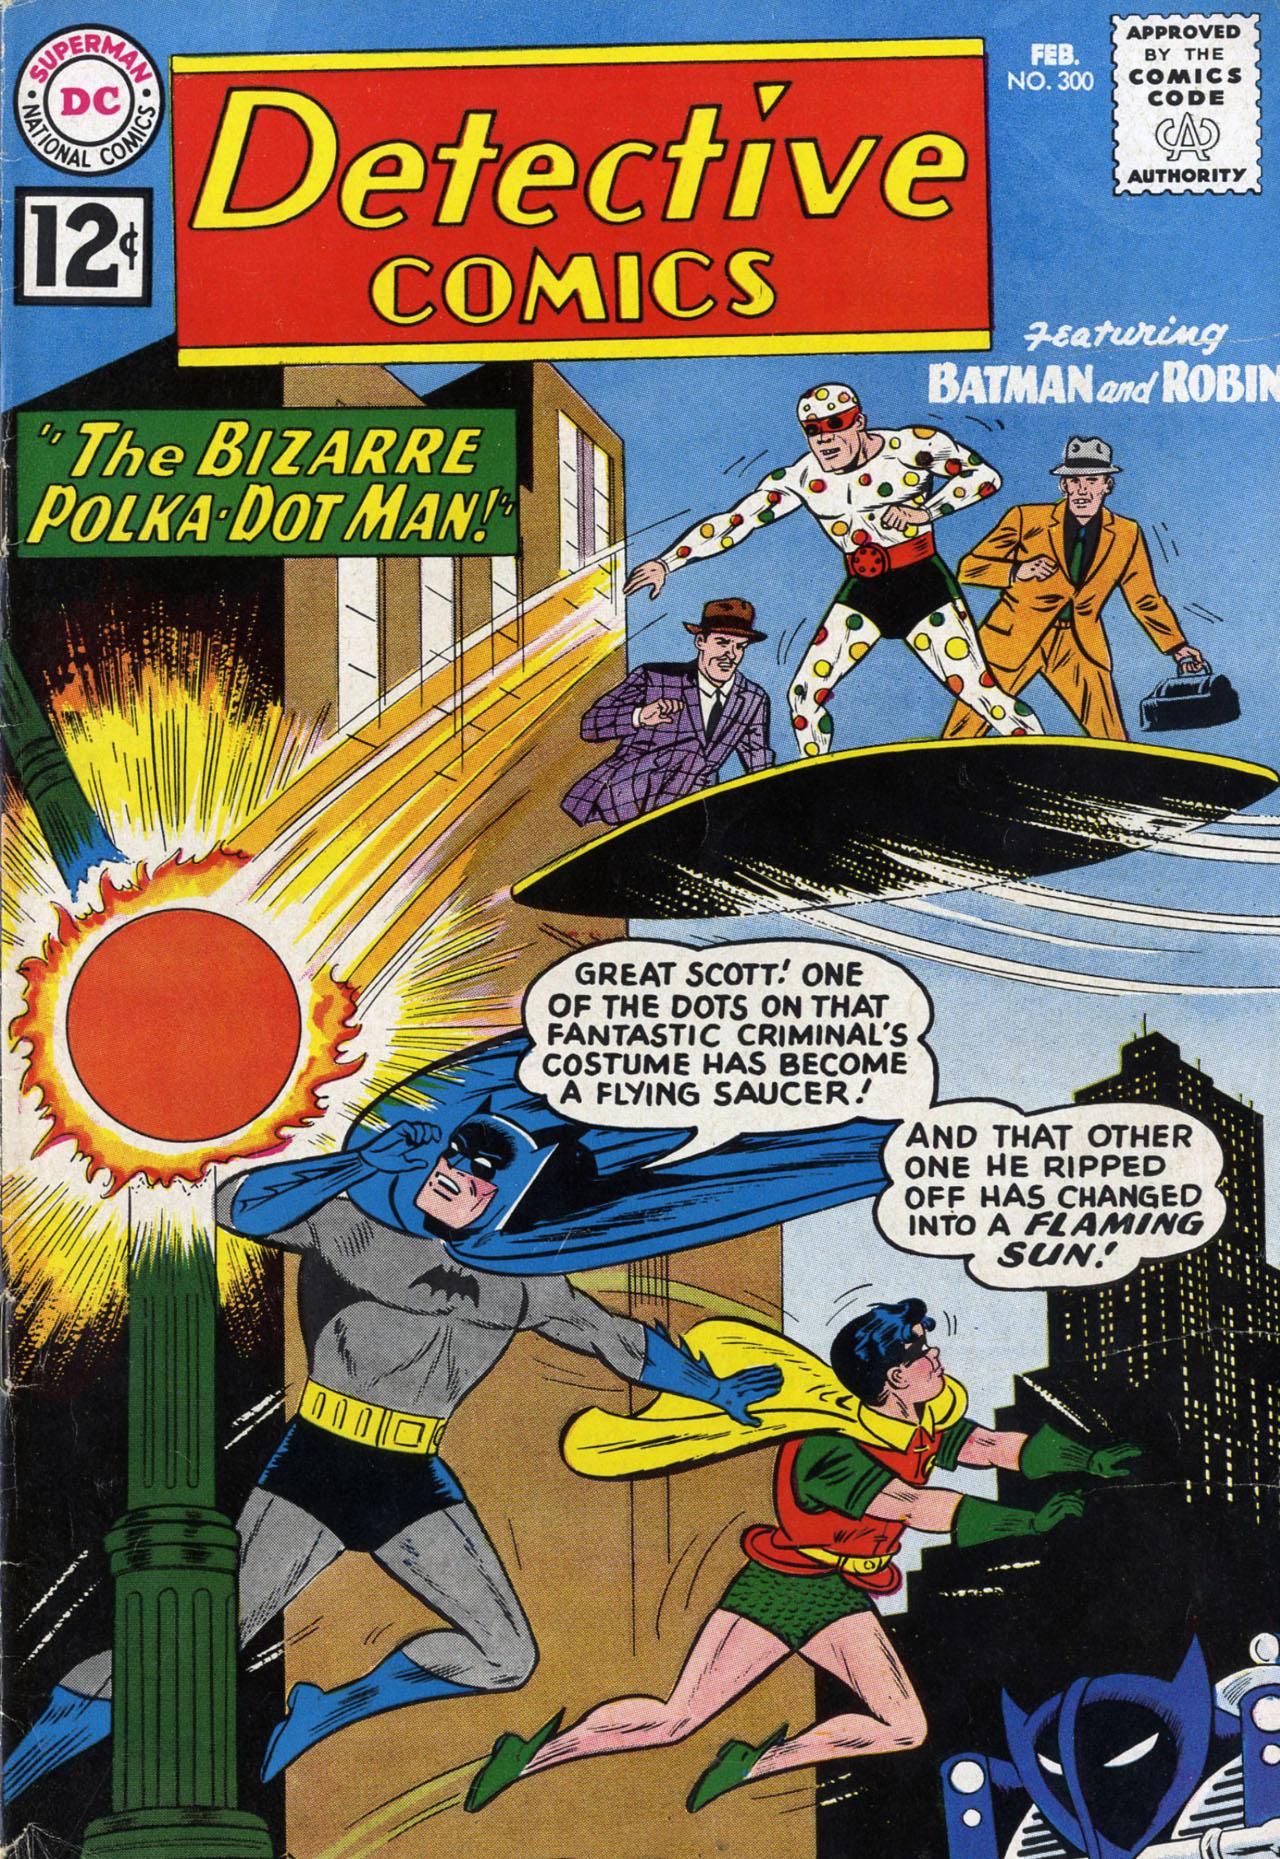 Detective Comics (1937) 300 Page 1